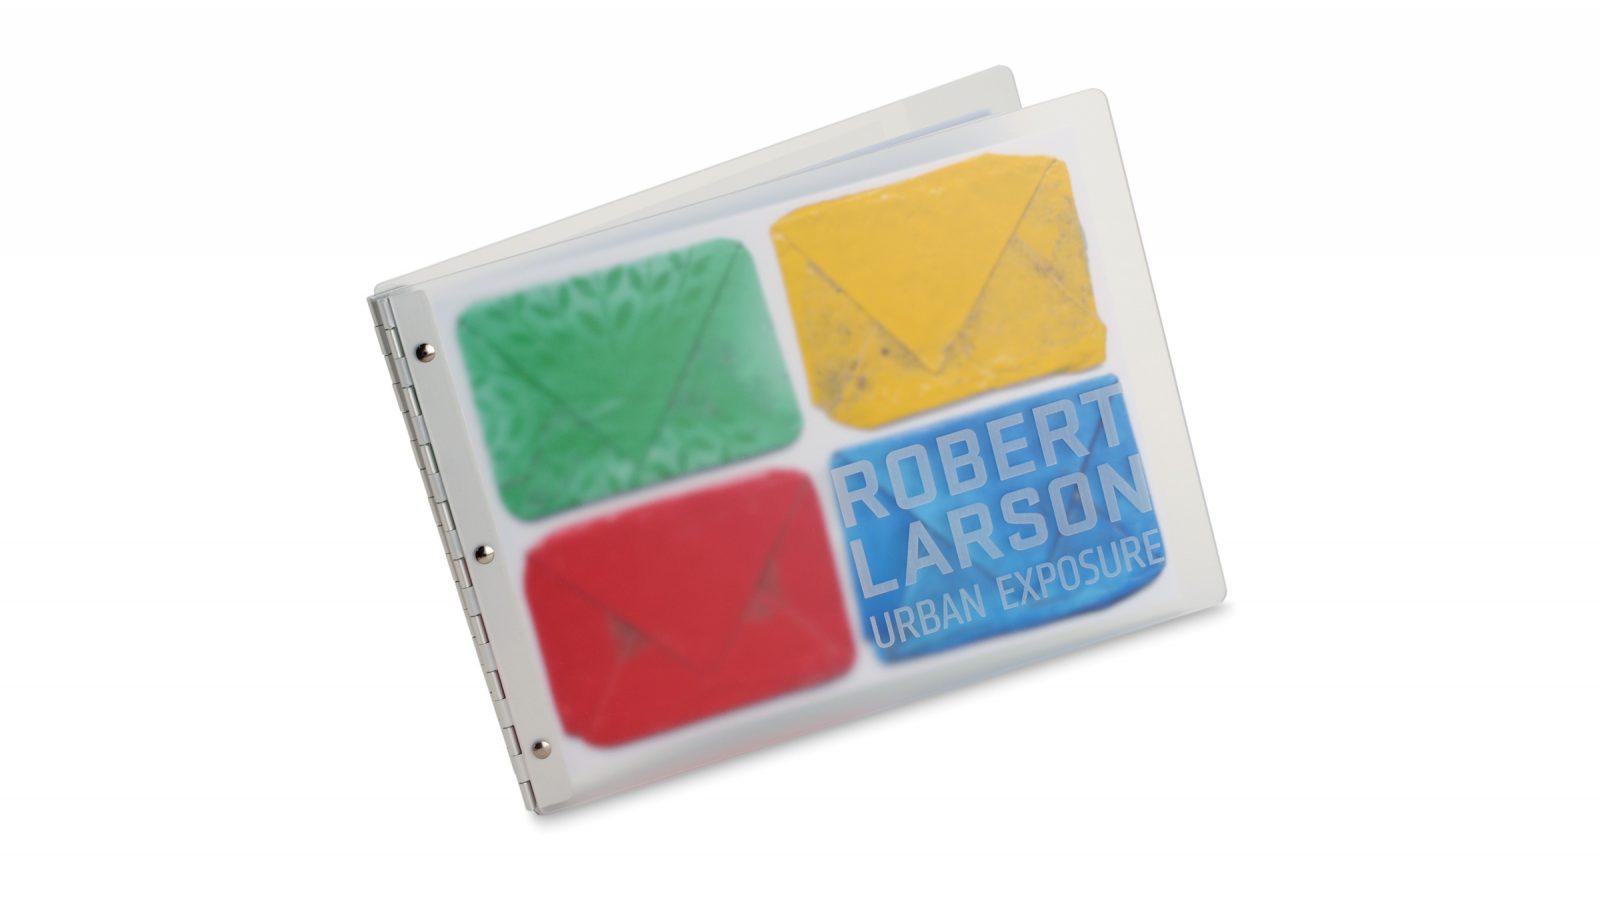 Robertlarson3 2Rationhomepage